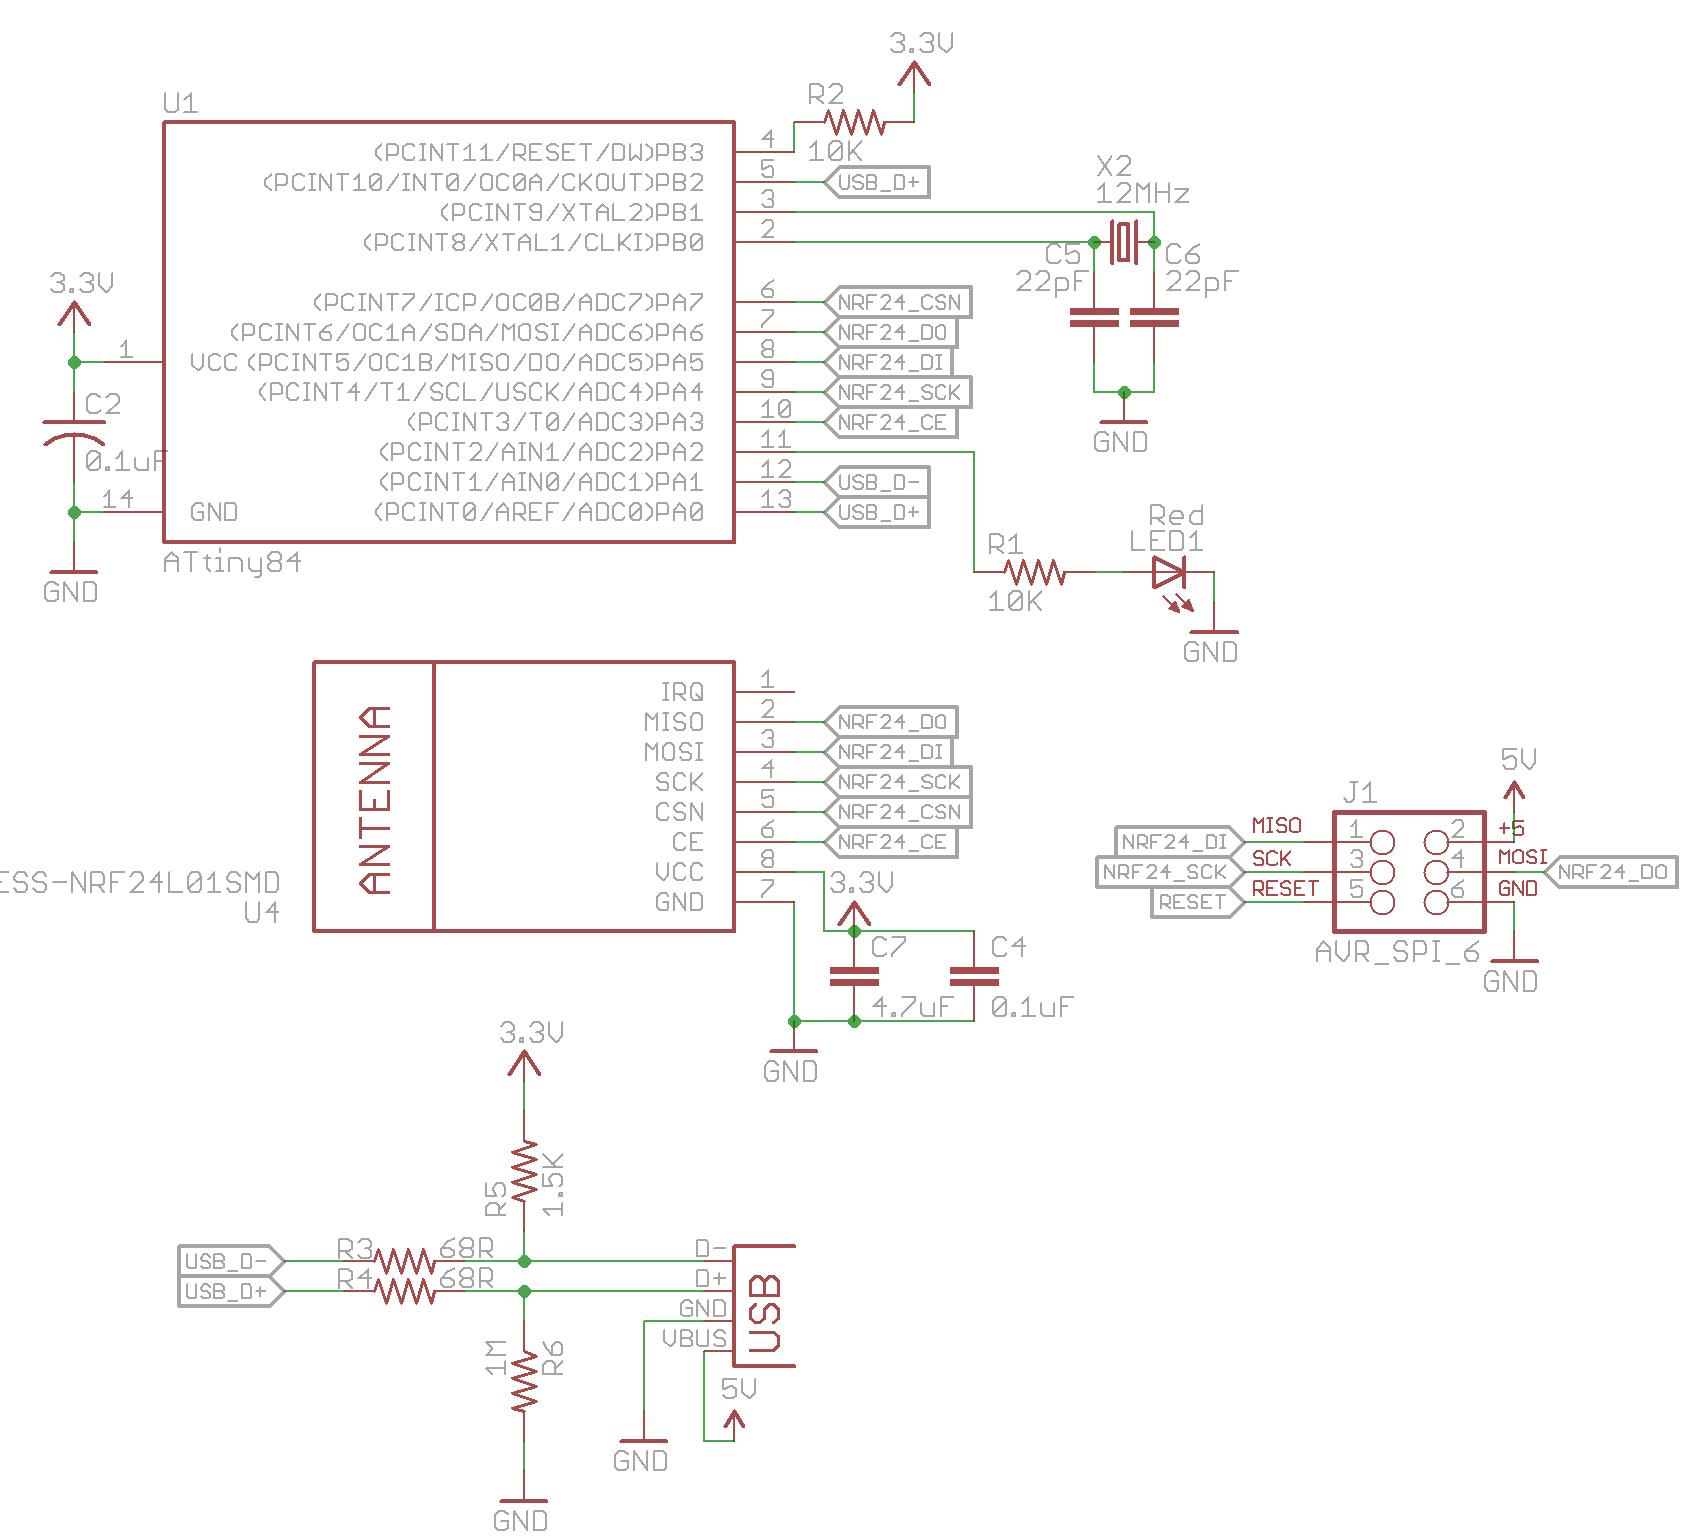 Lsdj Keyboard Wiring Diagram